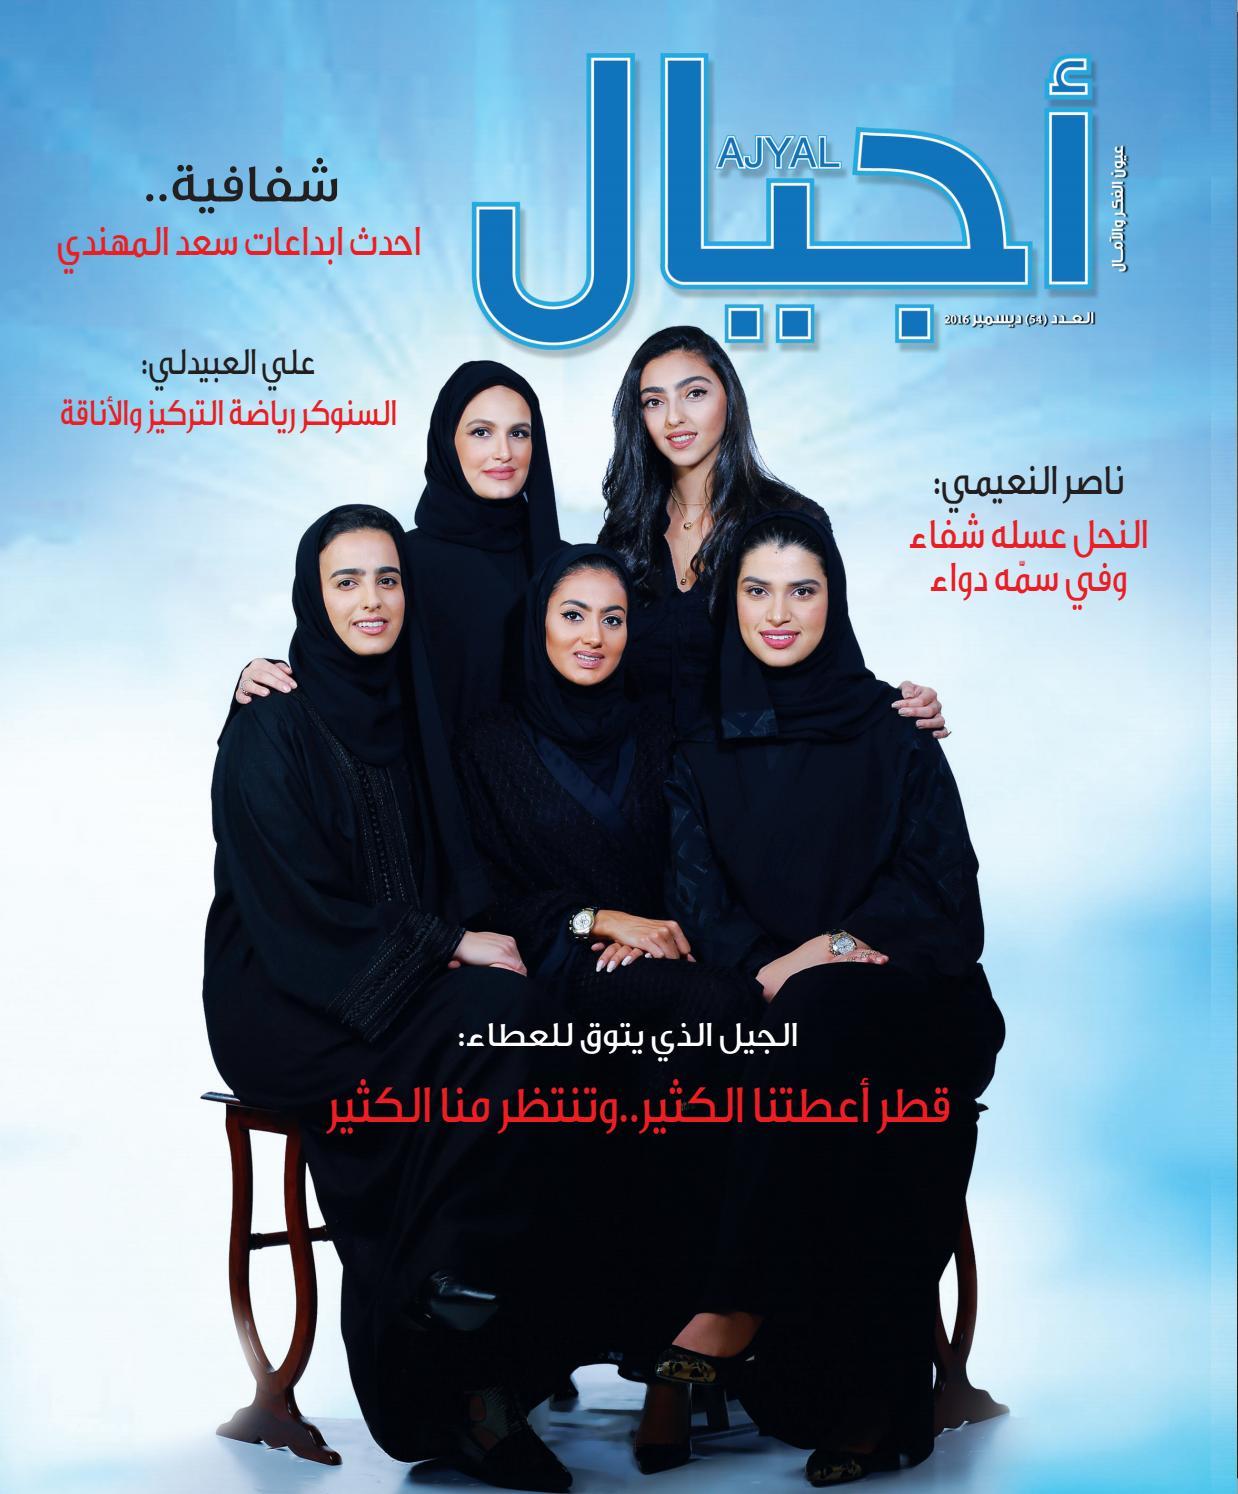 e6b53f4423a60 Ajyal Qatar by Ravi Nair - issuu